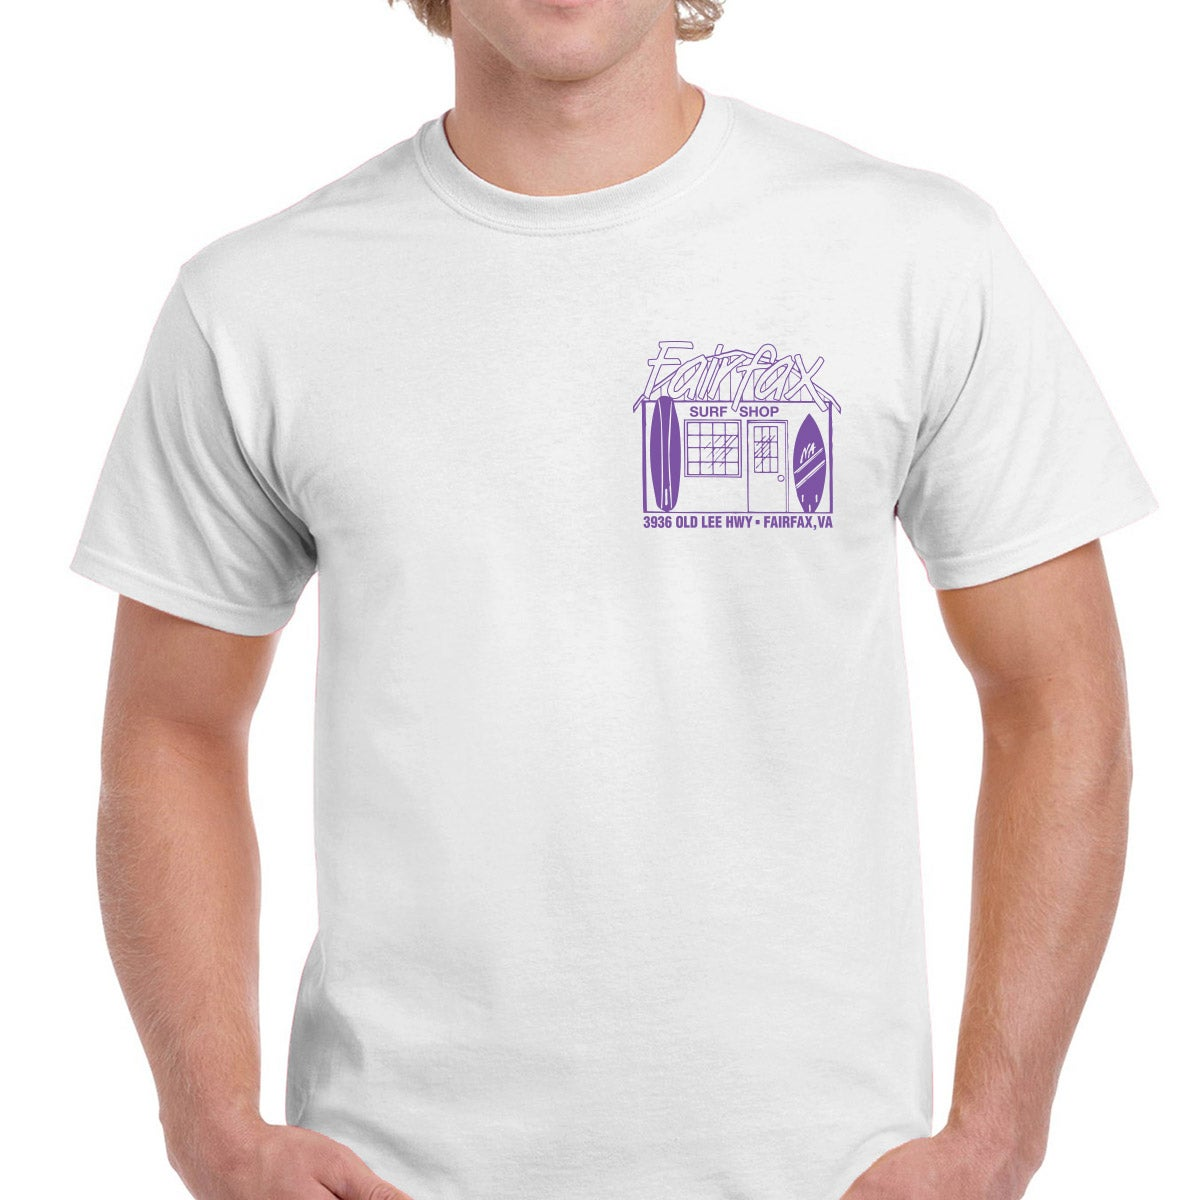 Image of FSS Shop T White/ Lavender